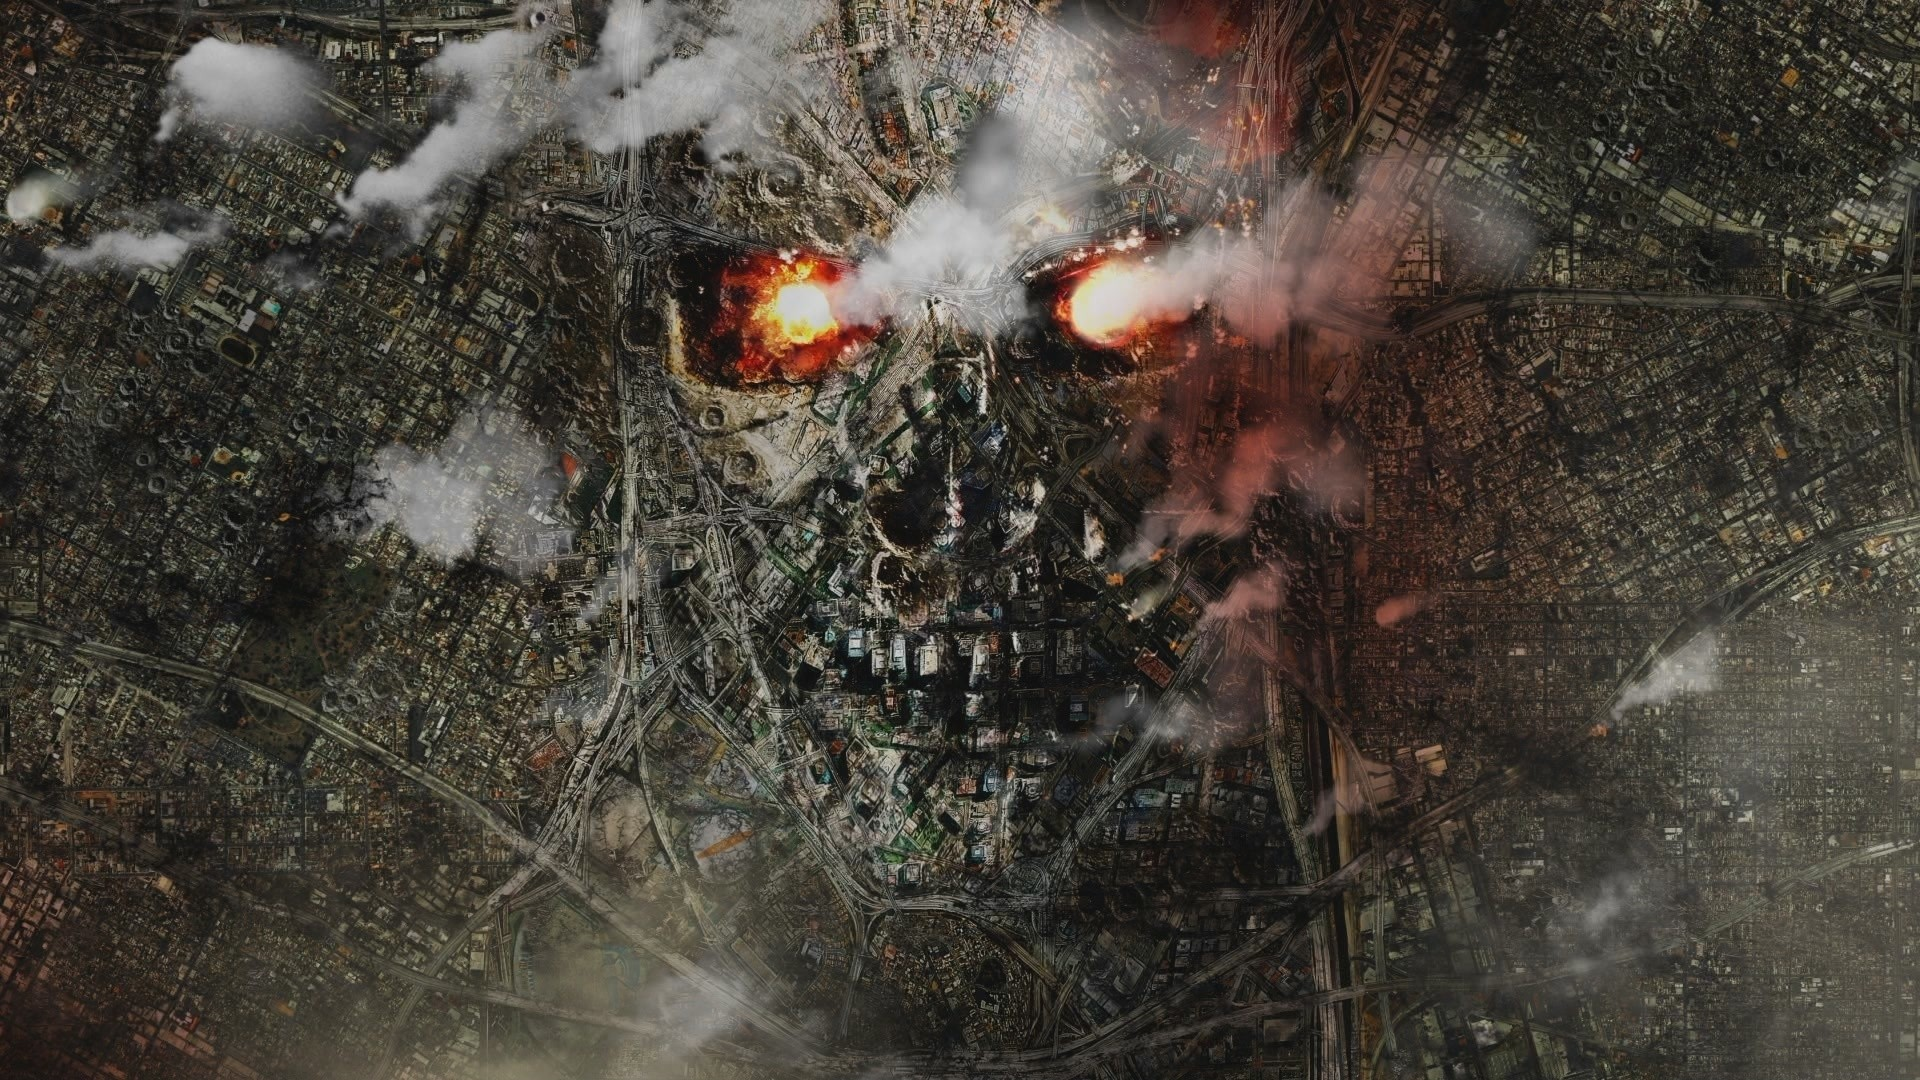 Best 37 Terminator Backgrounds on HipWallpaper Terminator 1920x1080